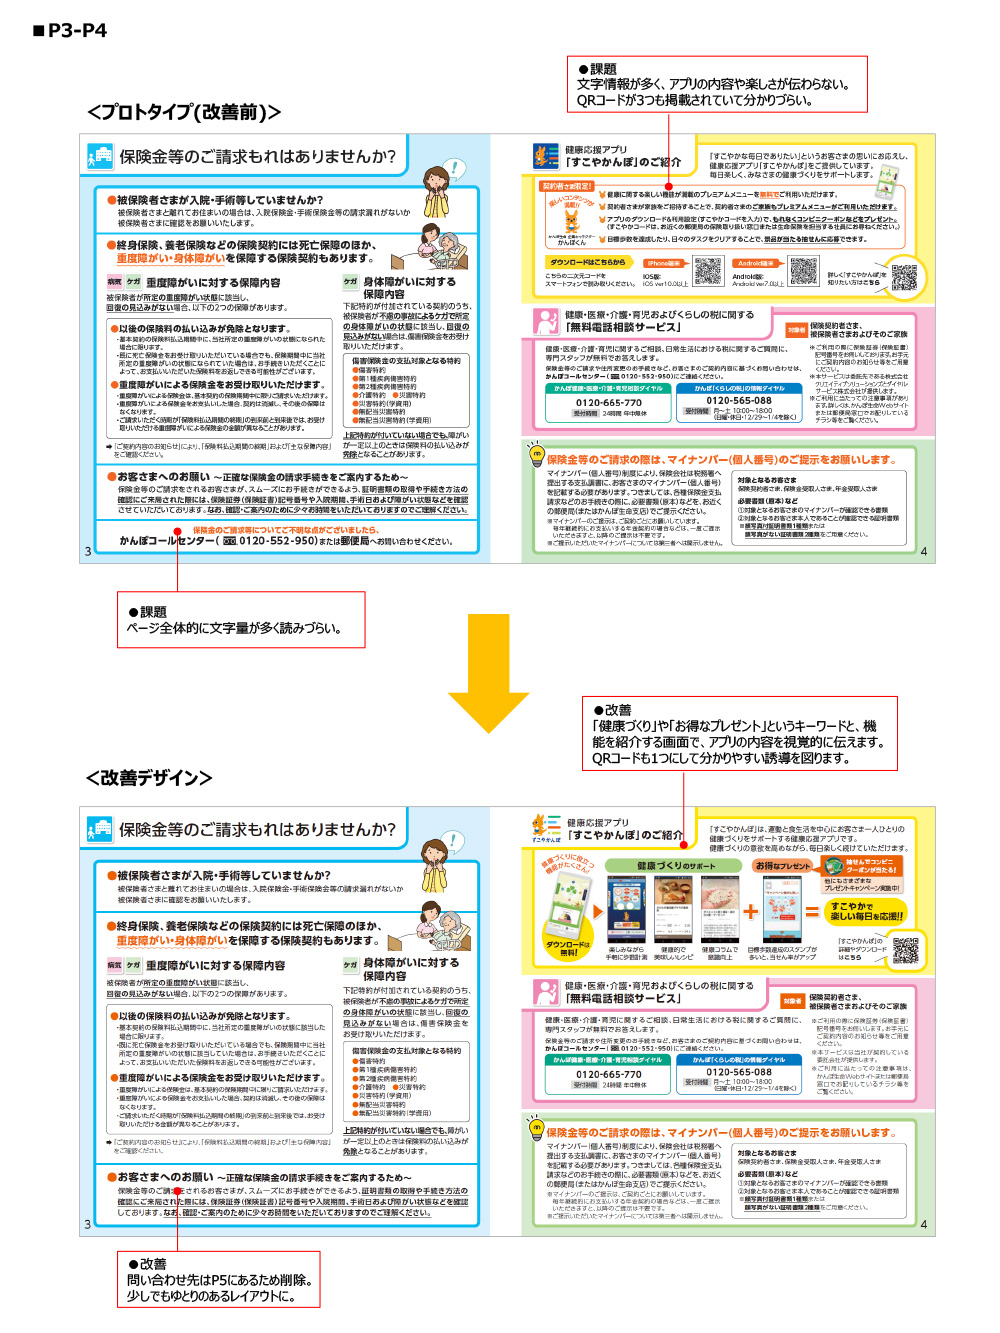 P3-P4 プロトタイプ(改善前)→改善デザイン